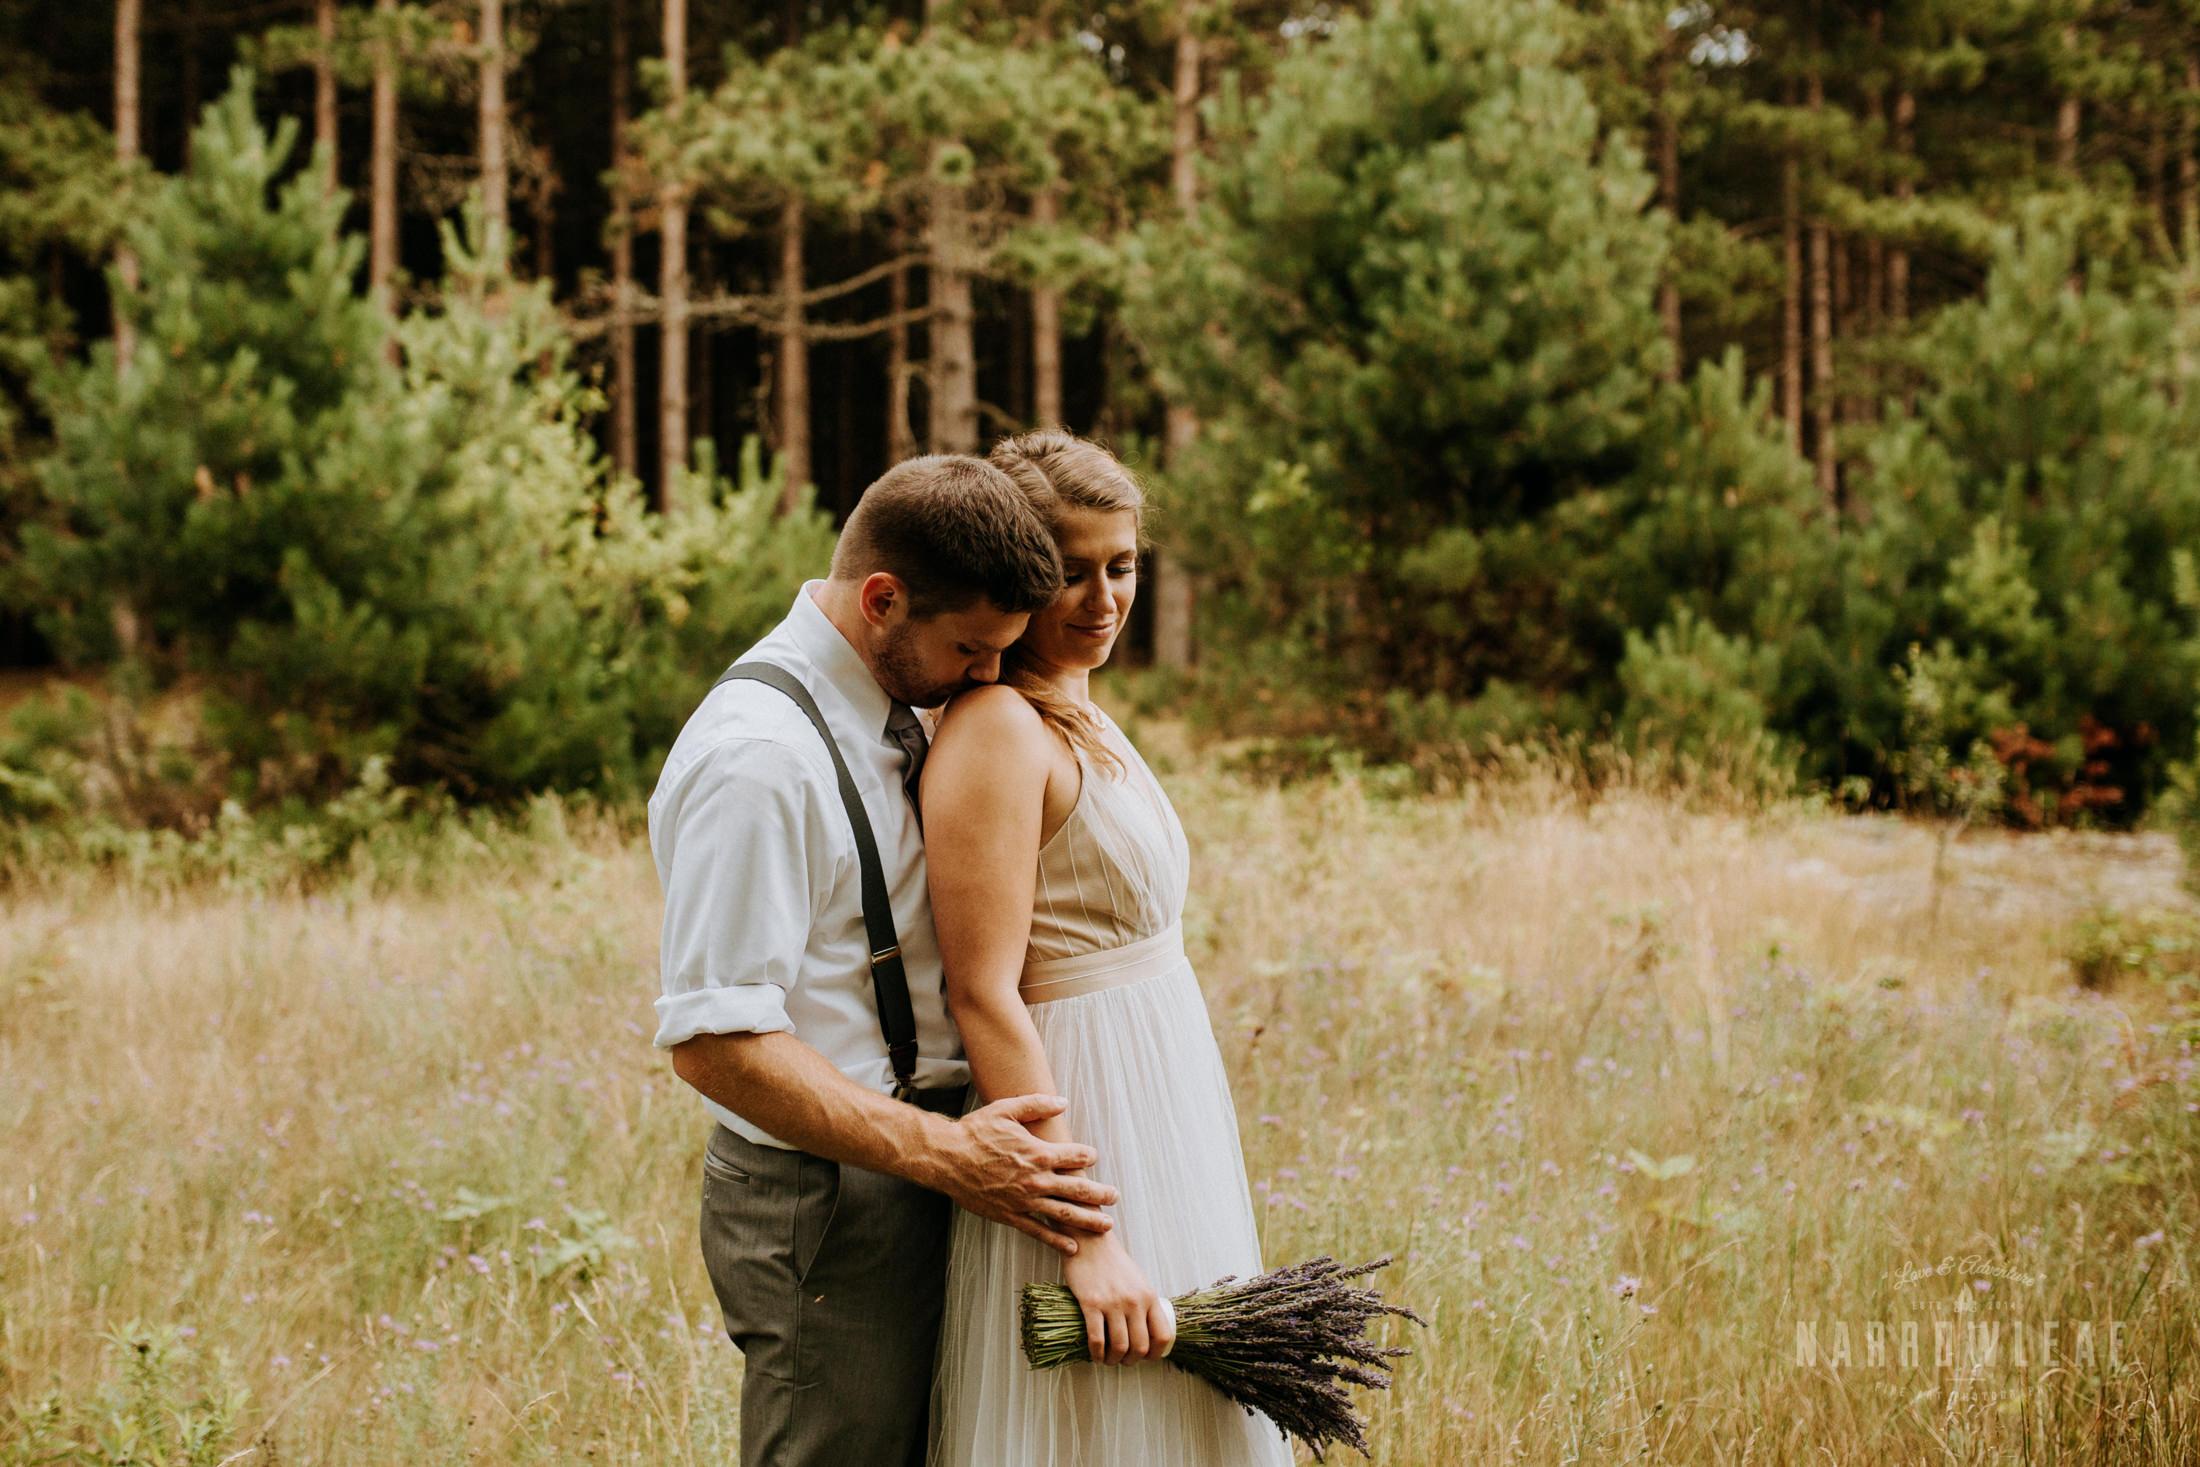 door-county-wedding-photographer-in-the-woods-Narrowleaf_Love_and_Adventure_Photography-9430.jpg